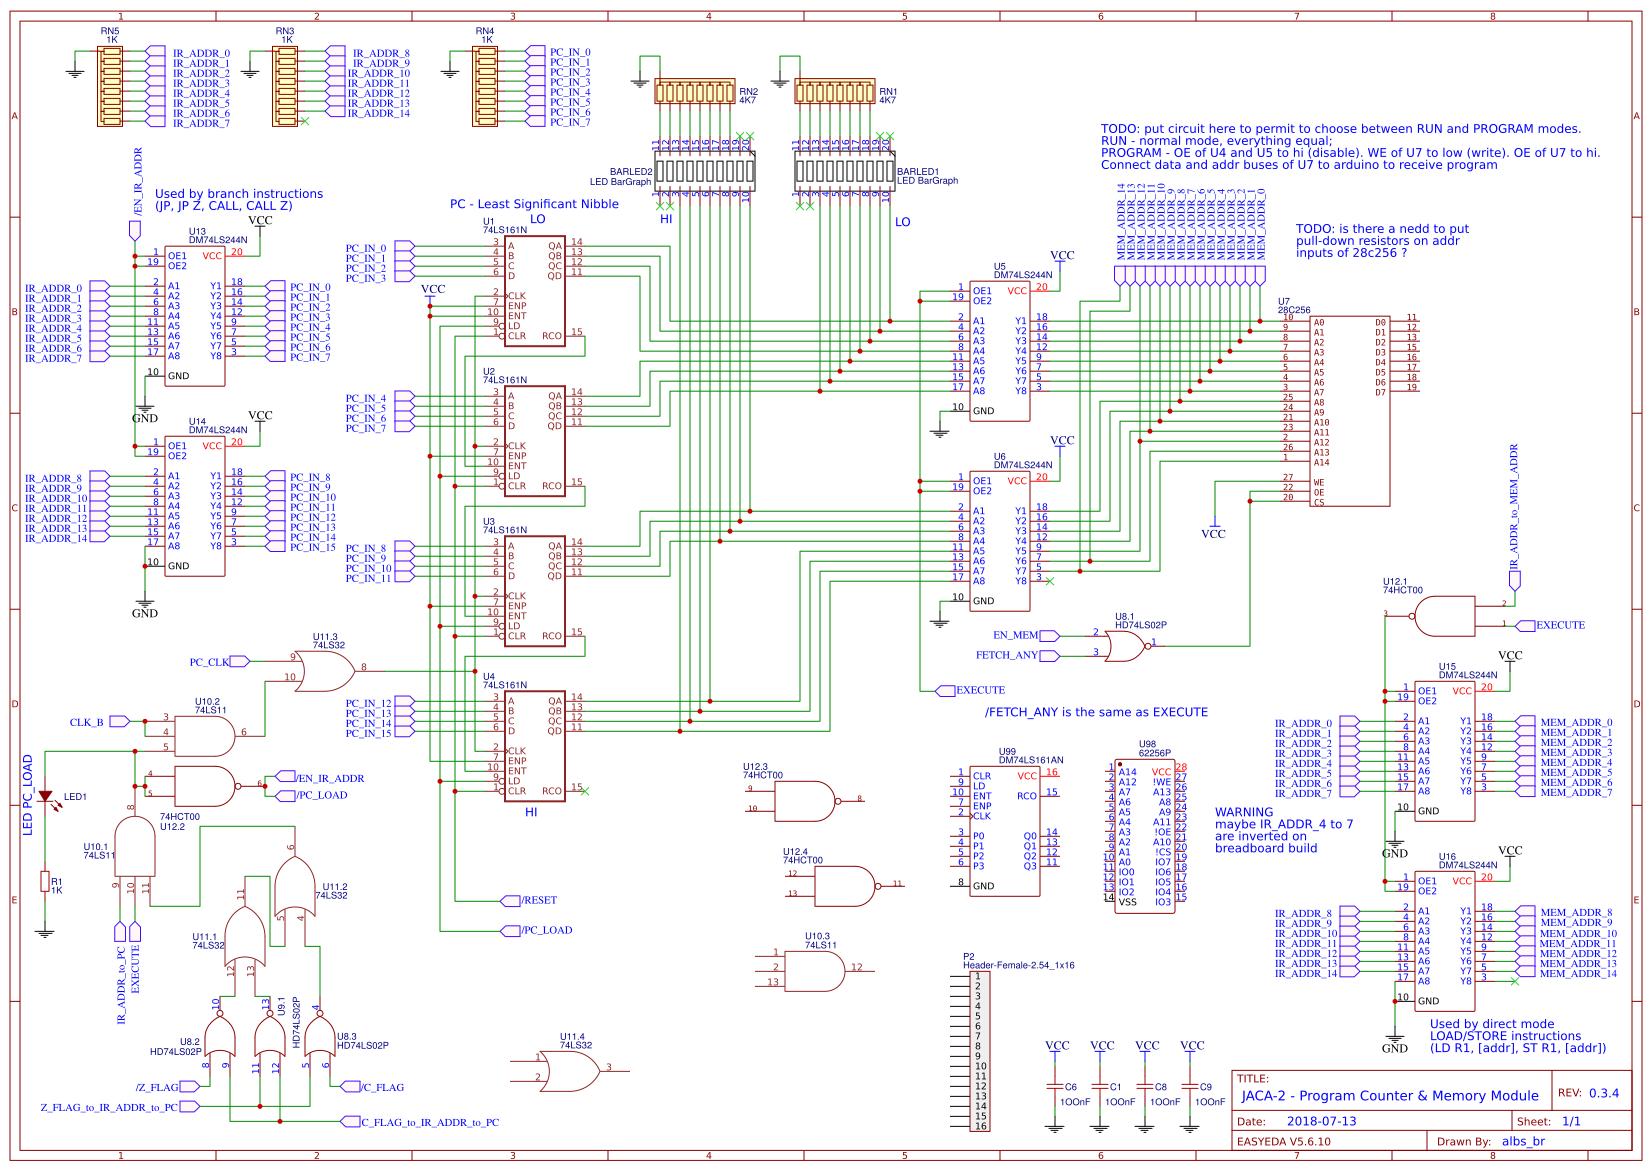 Snap 2 Digit Simple Digital Counter Circuit Using Cd4026 Photos On Optoisolatorcircuits Opto Isolator Image Module Page1 Easyeda